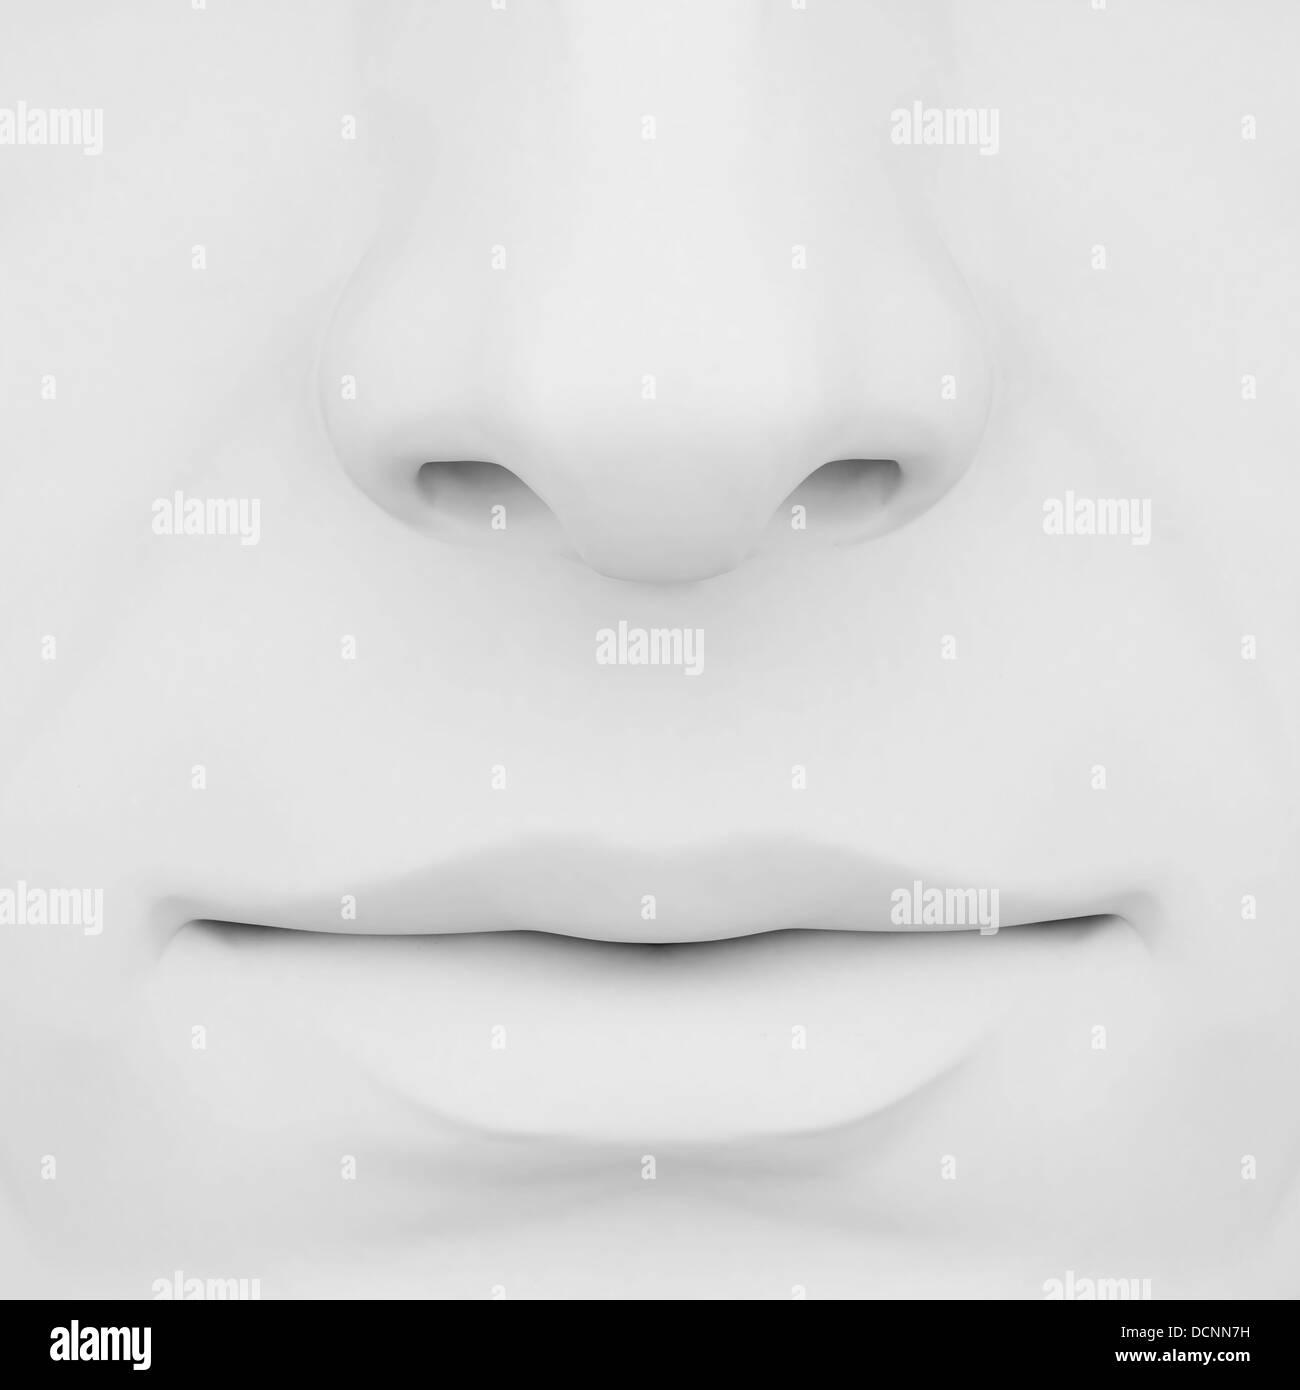 Nostril Anatomy Stockfotos & Nostril Anatomy Bilder - Alamy